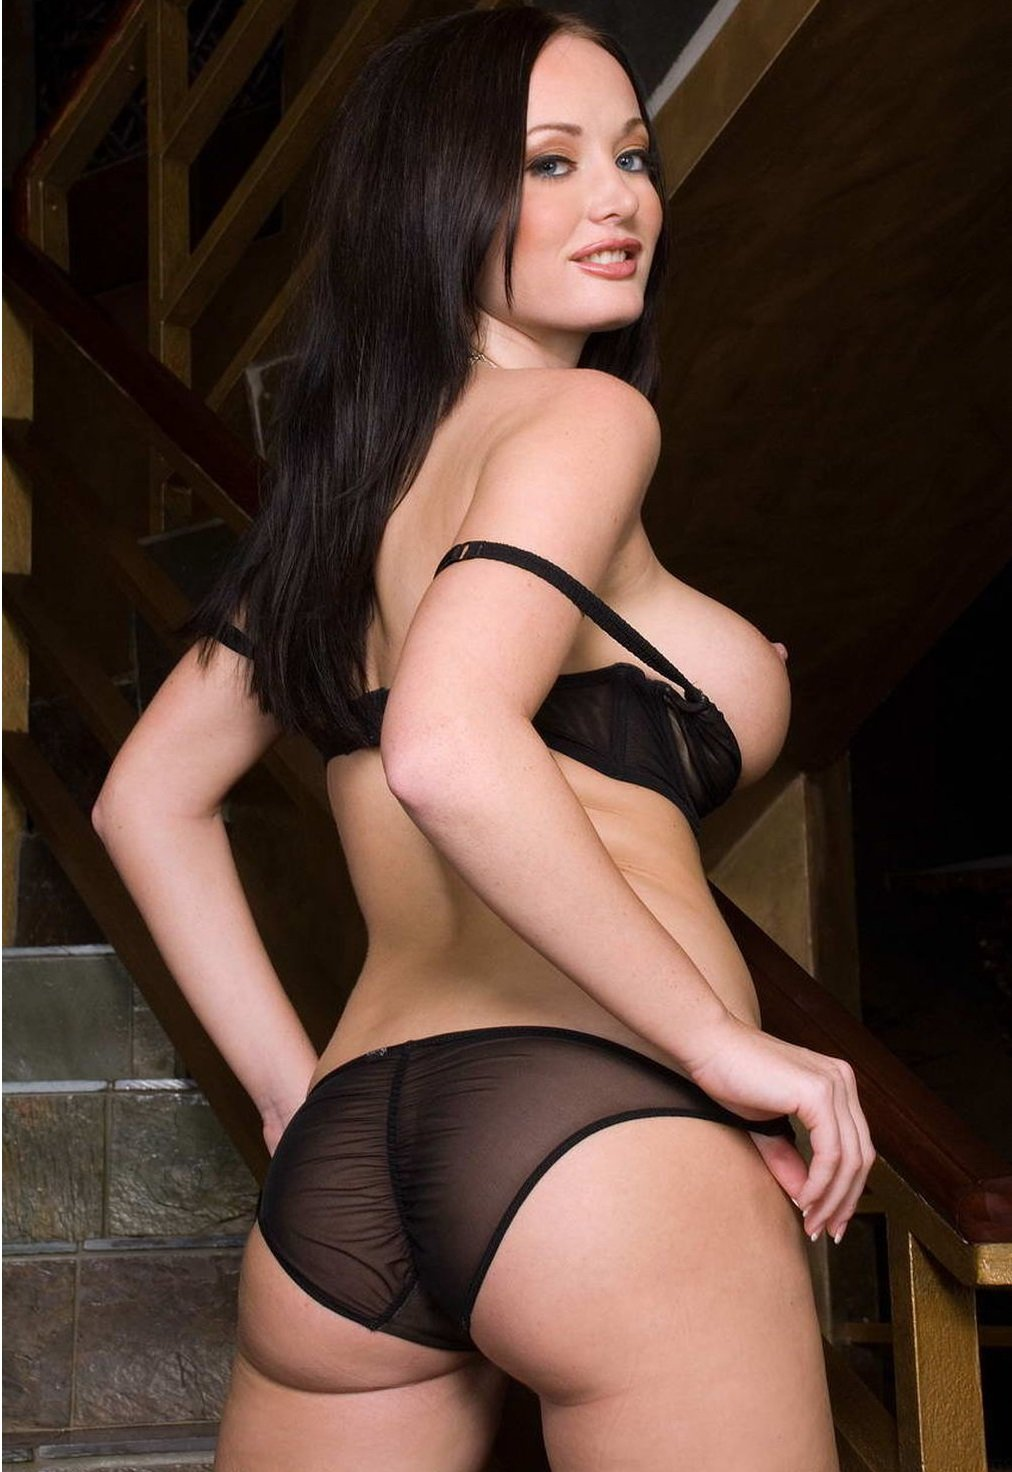 Gwiazda porno: Melissa Lauren